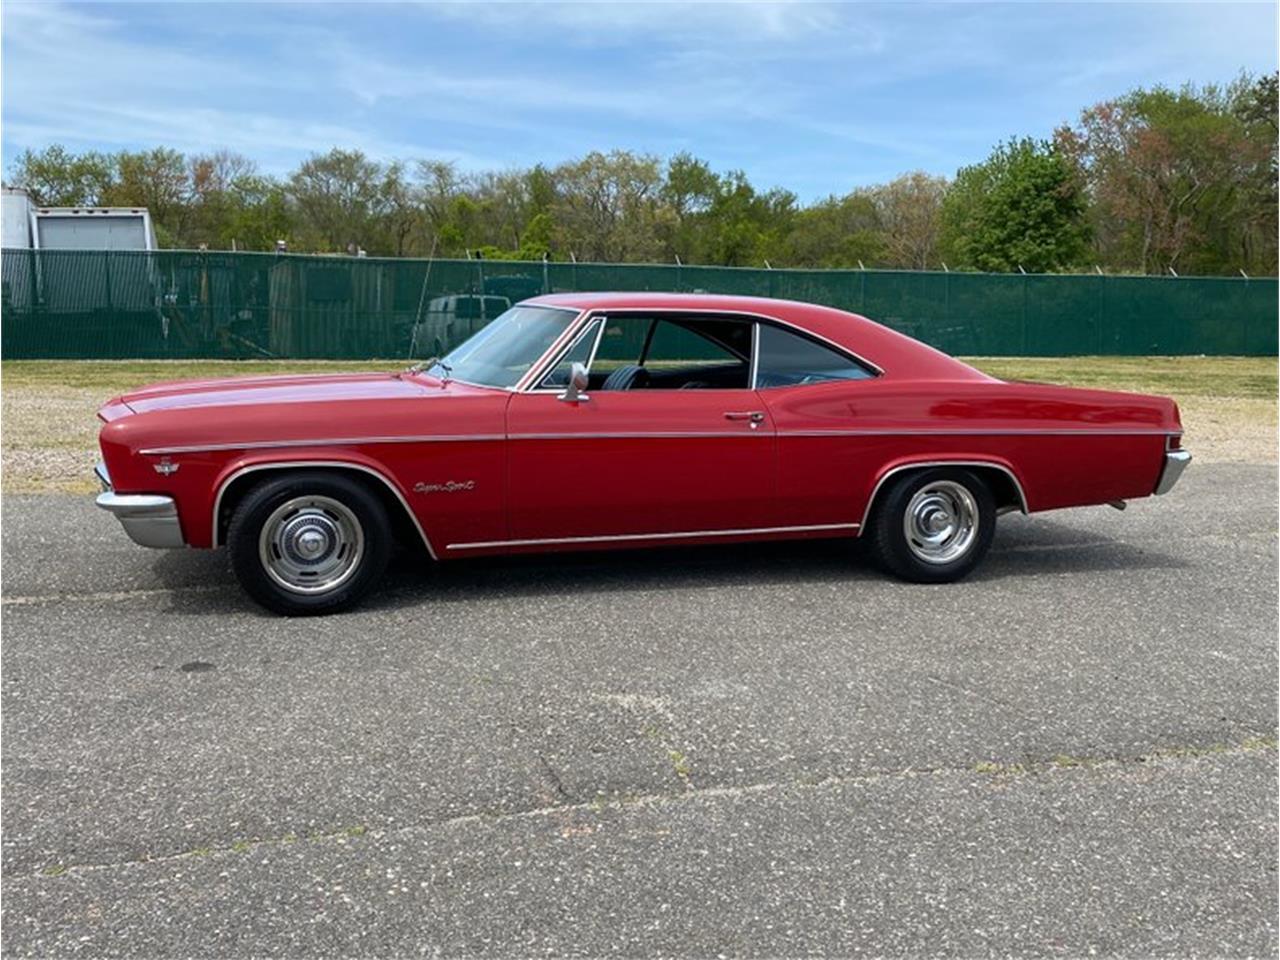 1966 Chevrolet Impala (CC-1351121) for sale in West Babylon, New York